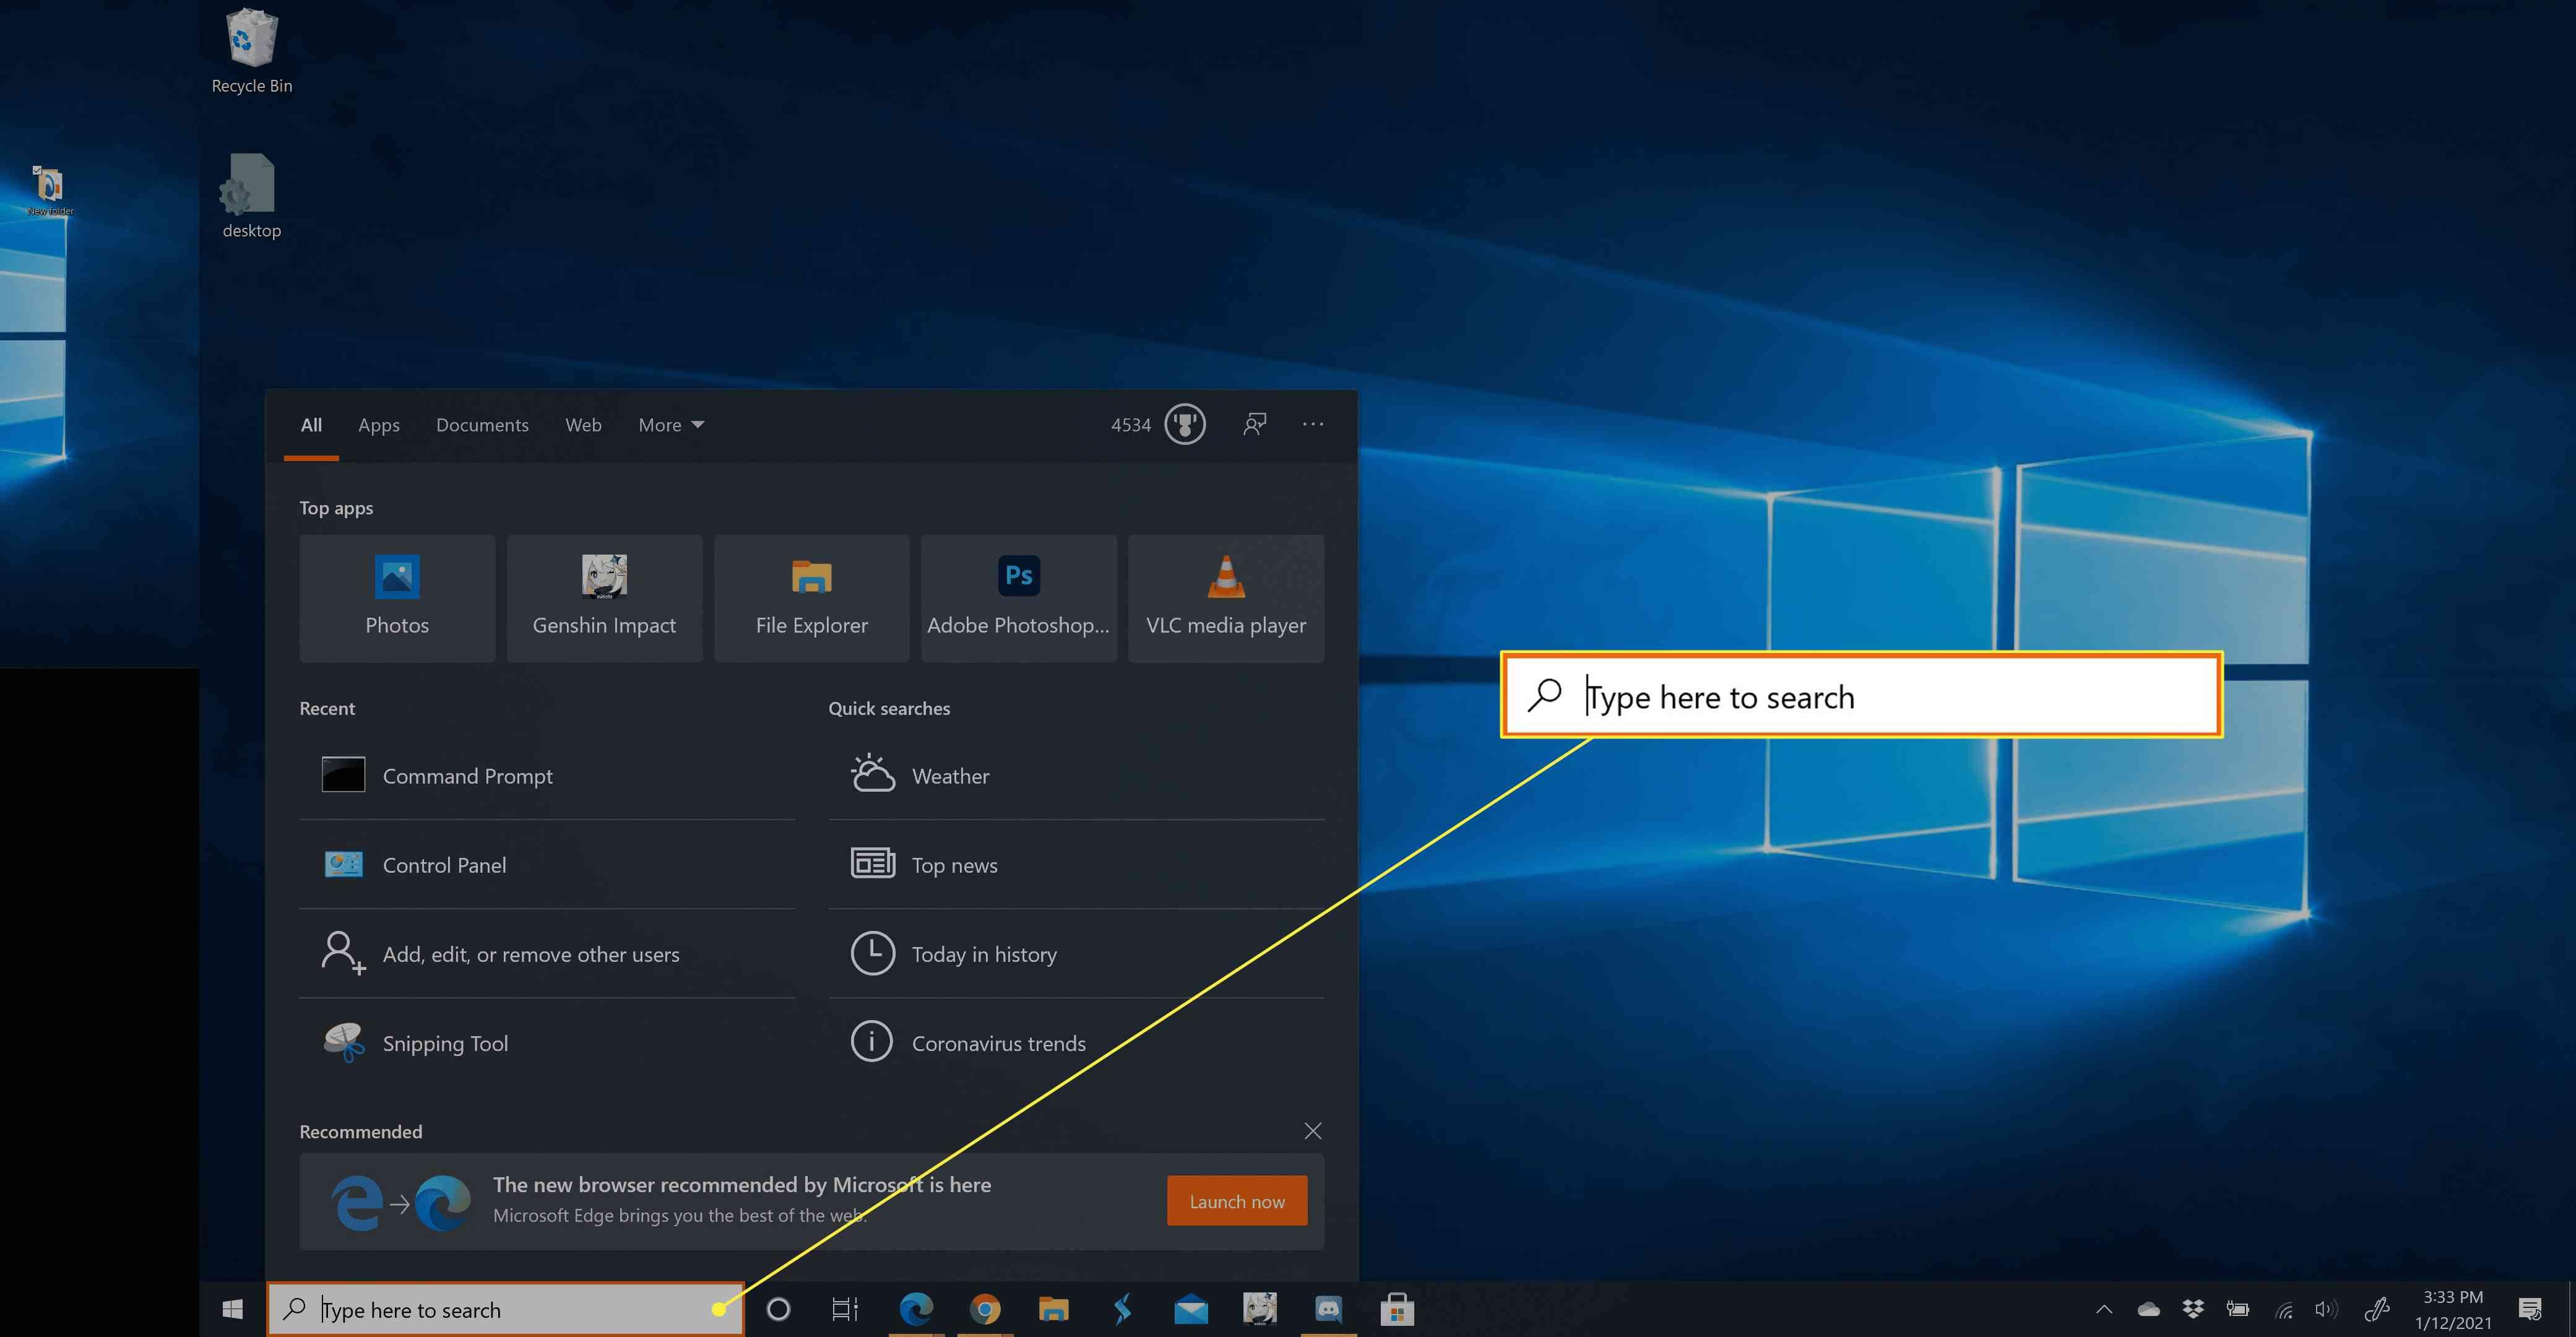 The Windows 10 taskbar search menu.